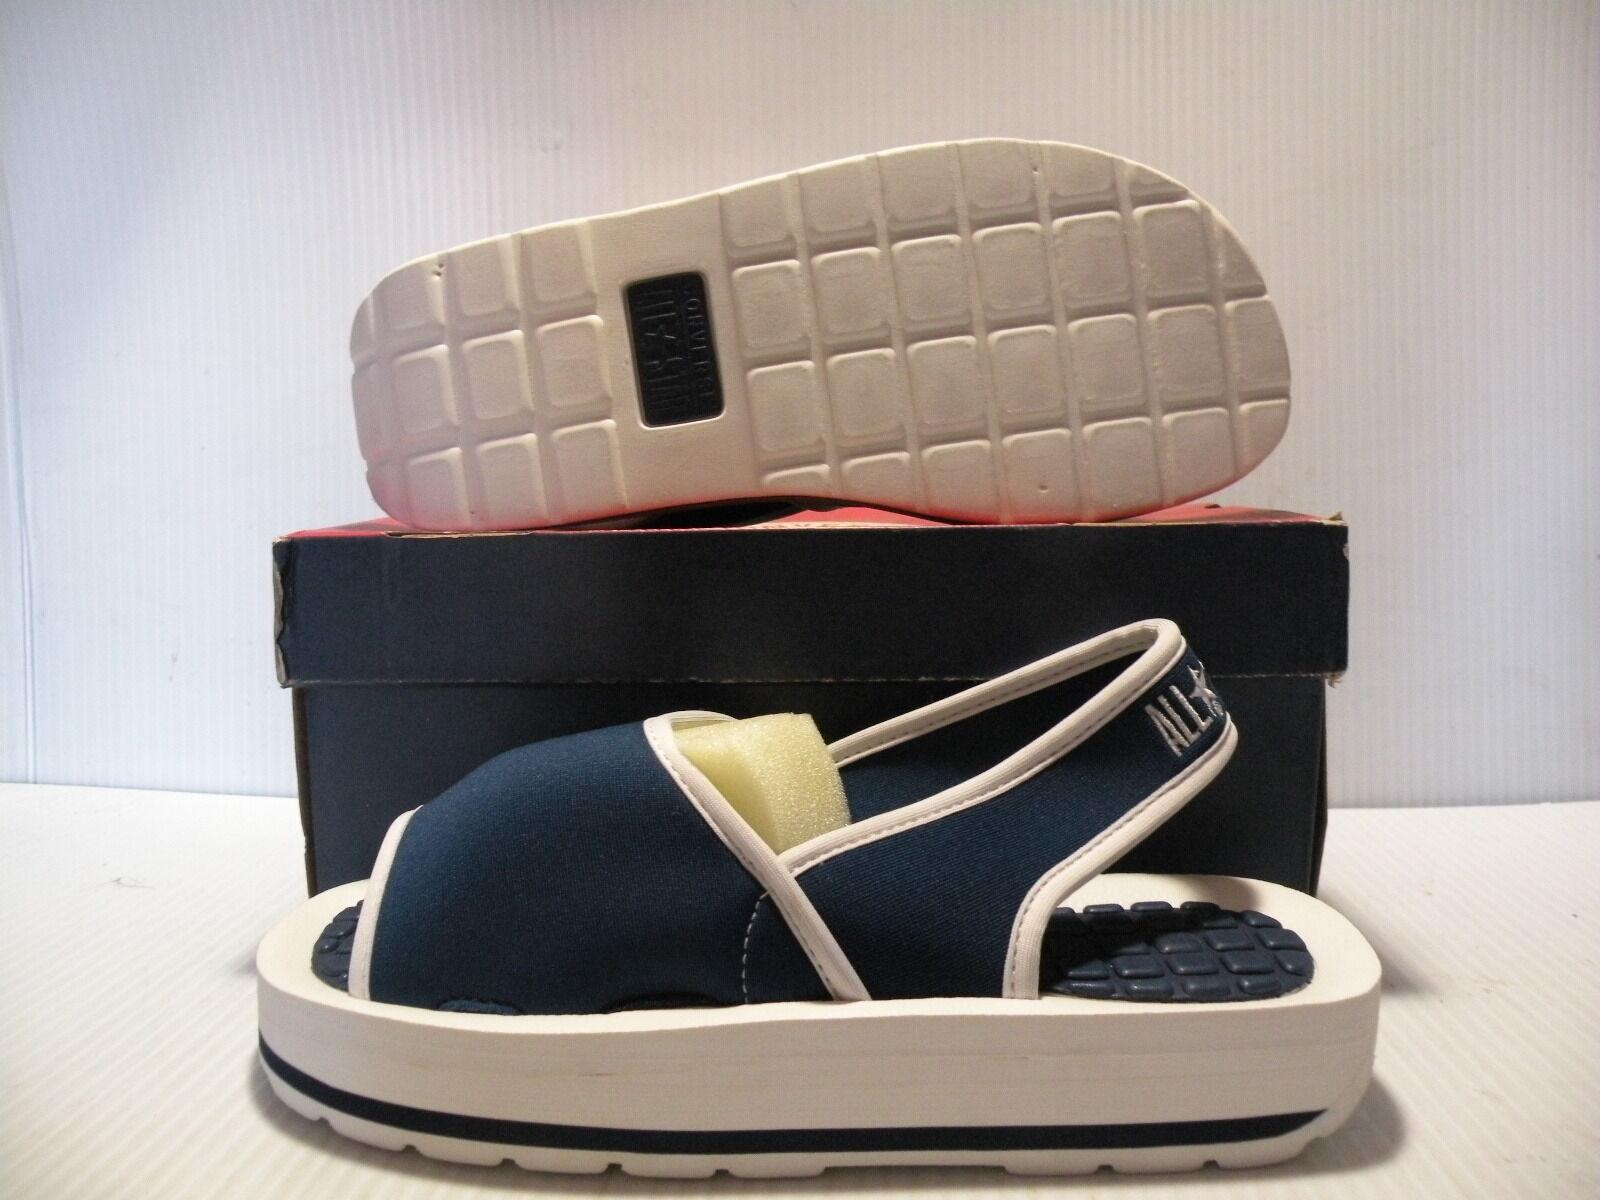 CONVERSE SLING-RAY SANDALS ALL STAR CT WOMEN Schuhe Blau/Weiß 55167 55167 Blau/Weiß SIZE 9 NEW caaa75